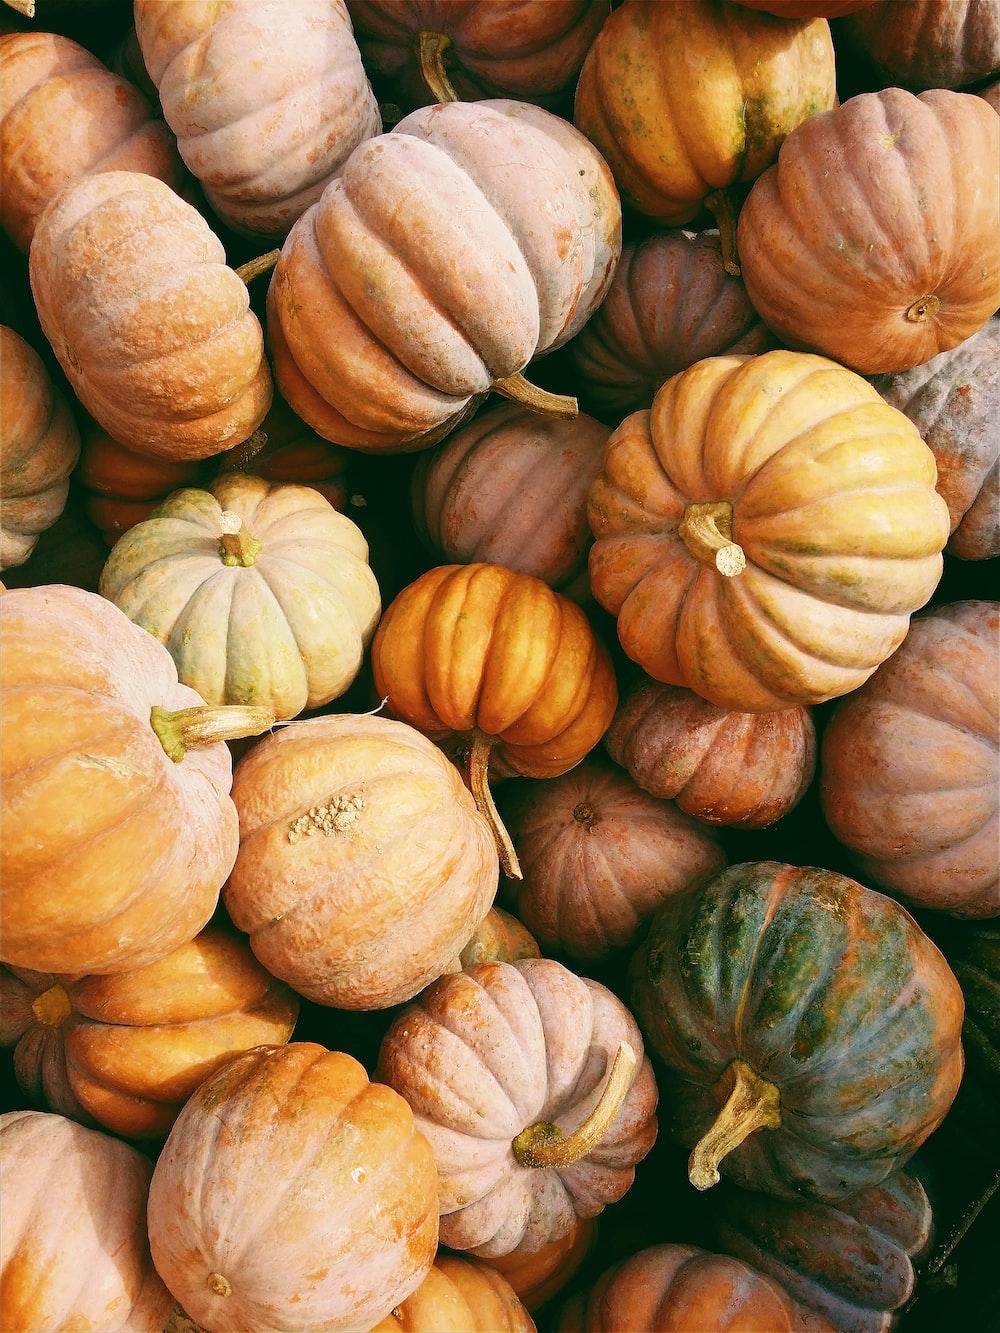 photo of orange and green squash lot